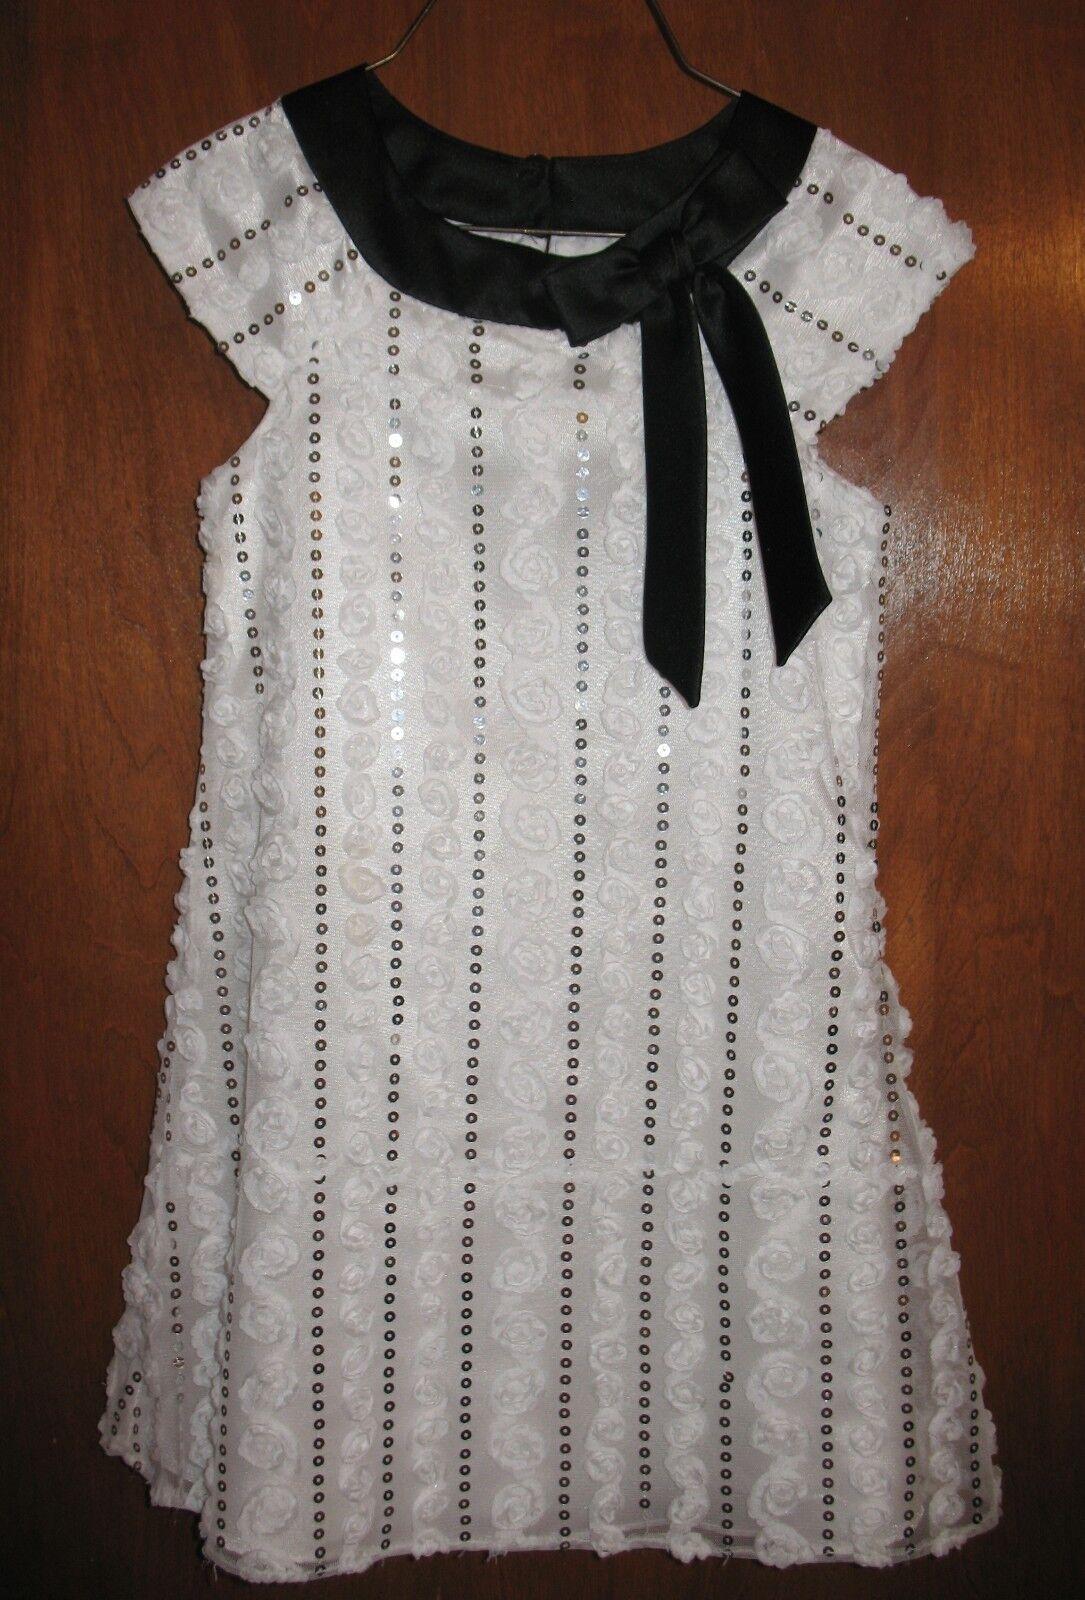 RARE EDITIONS Size 5 CAP-SLEEVE DRESS (white w/ black trim & sequins) perfect!